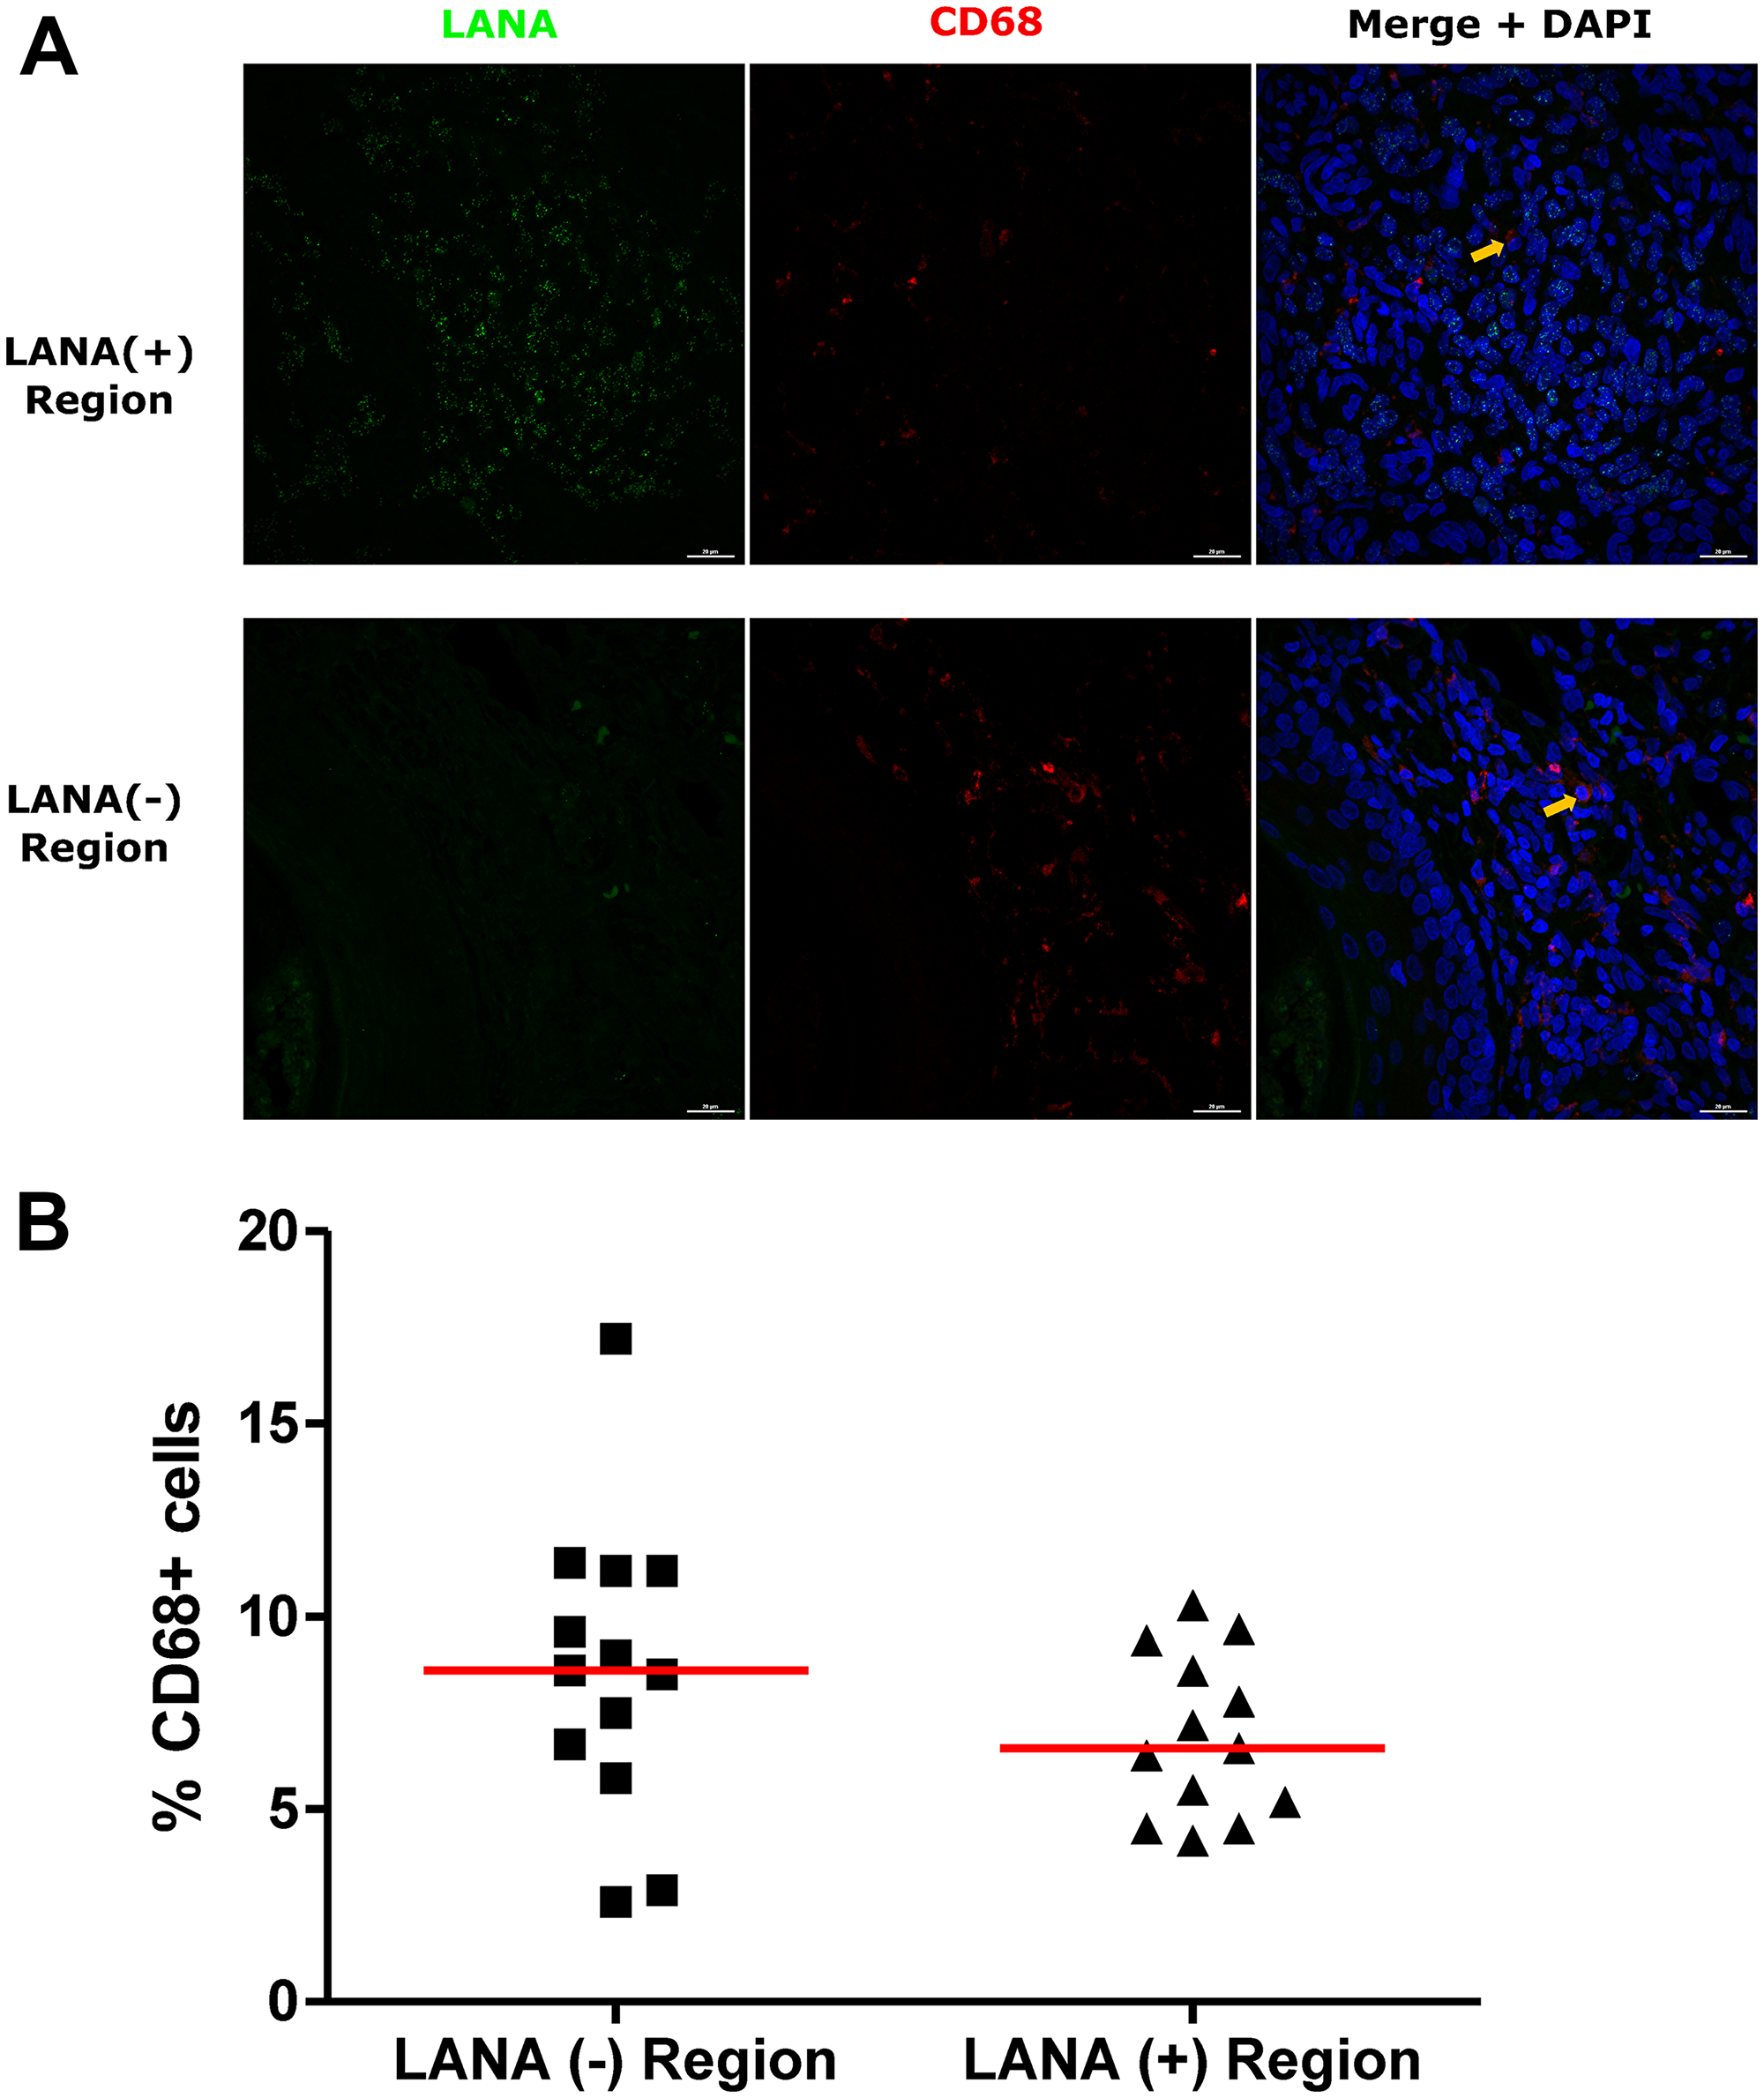 Dual-immunofluorescence staining of Kaposi's Sarcoma-associated Herpesvirus (KSHV) Latency Associated Nuclear Antigen (LANA) protein and CD68 on Kaposi's Sarcoma (KS) tissues.